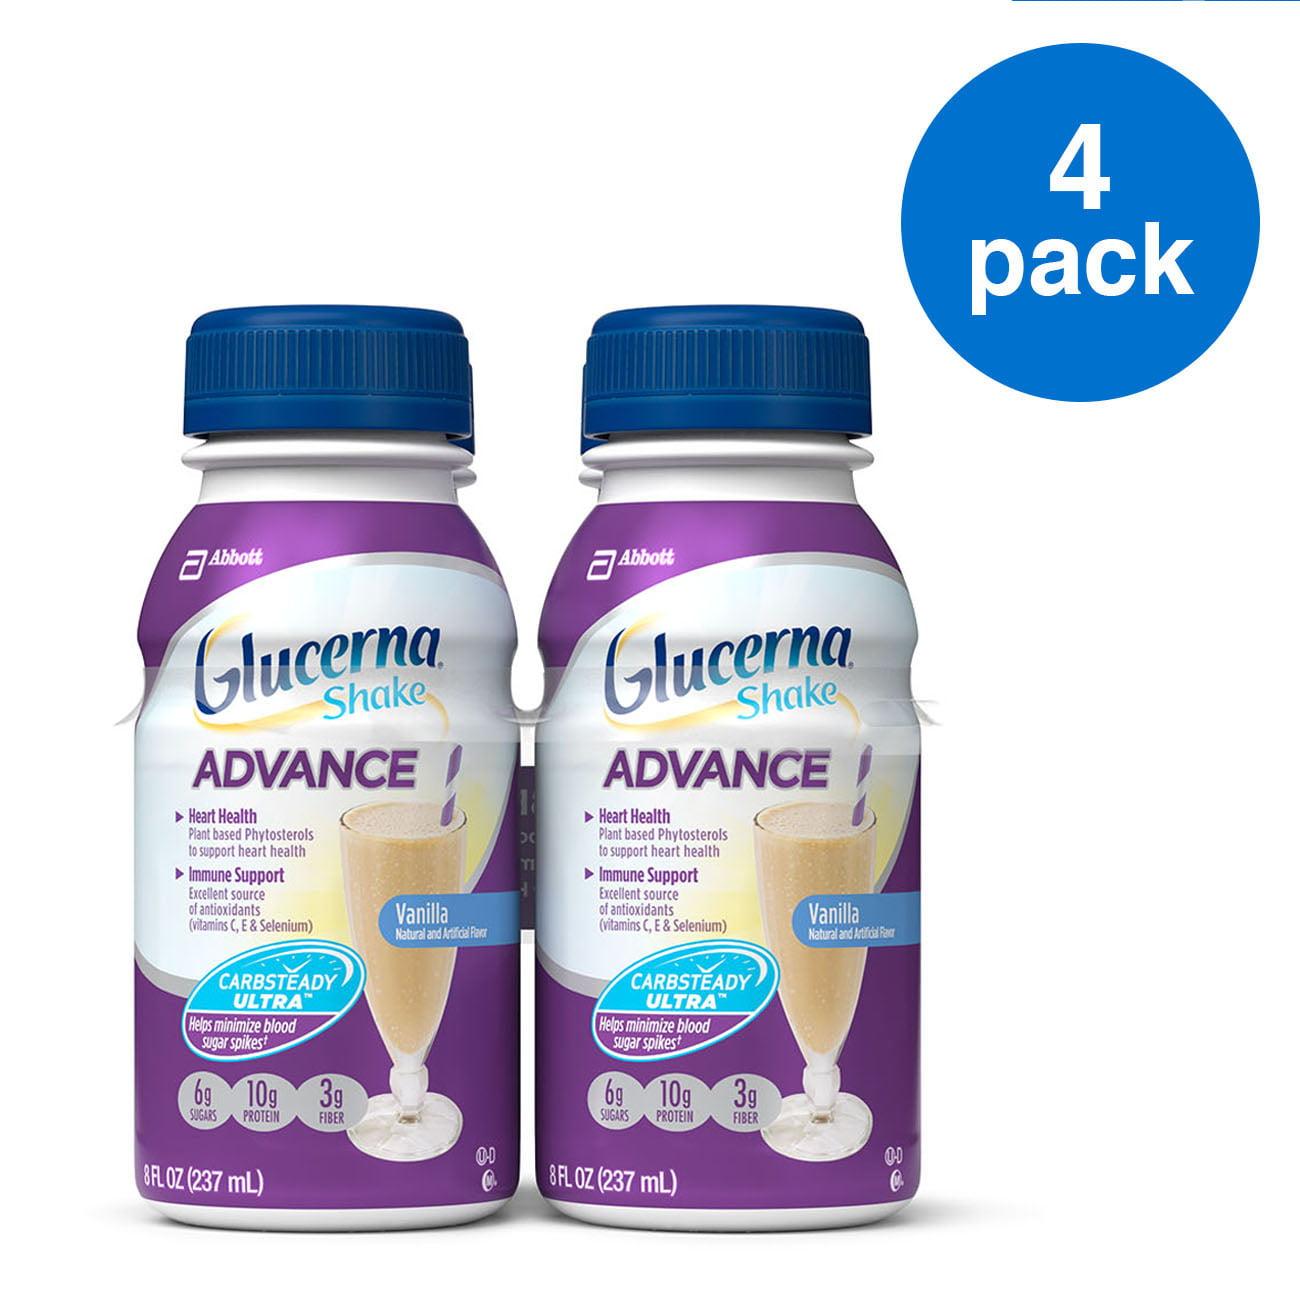 Glucerna Advance Nutrition Shake, To Help Manage Blood Sugar, Vanilla, 8 Oz, 4 Ct